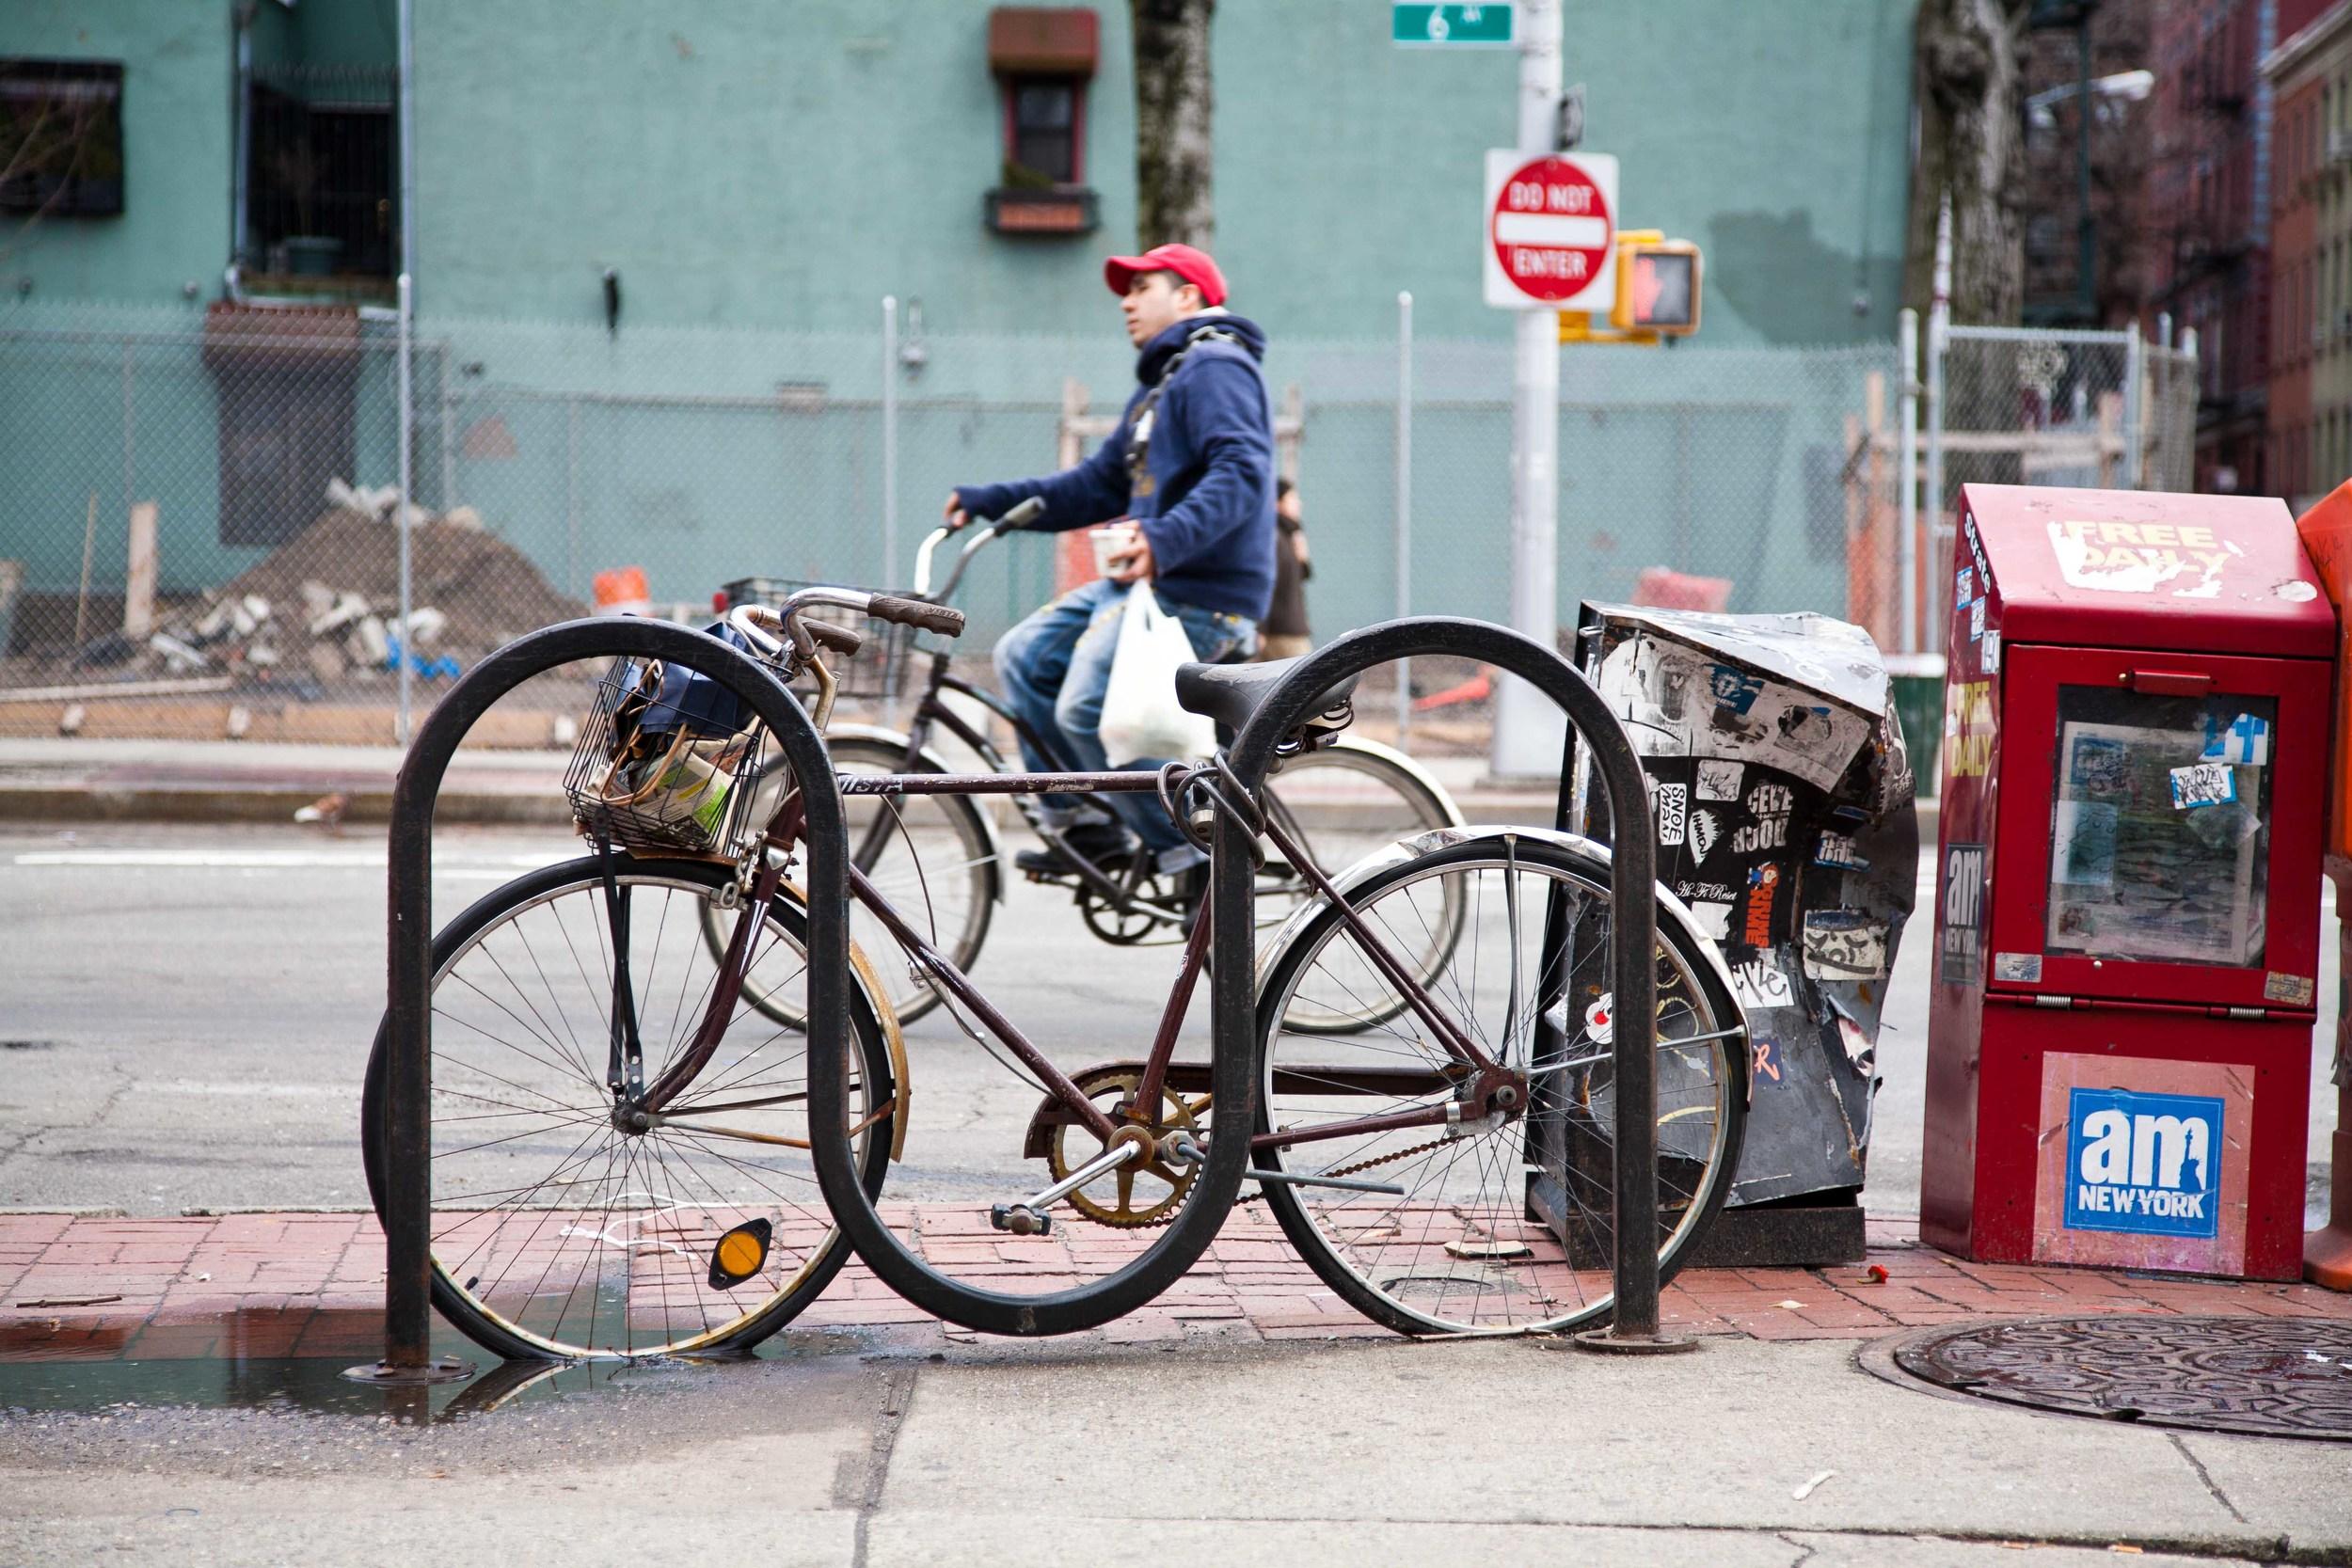 Bikescapes-8.jpg